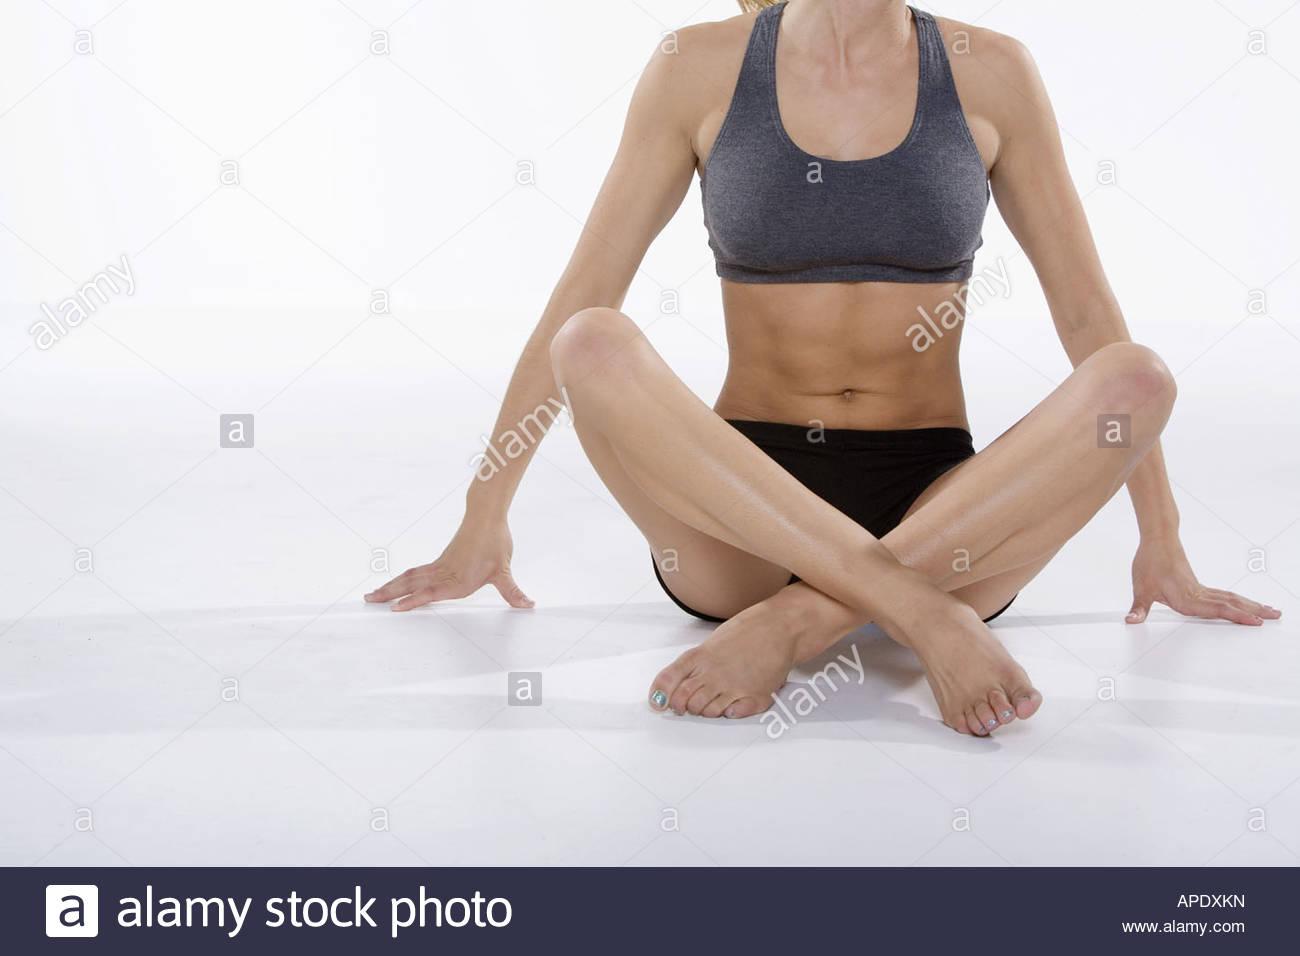 Woman in athletic gear sitting cross-legged - Stock Image